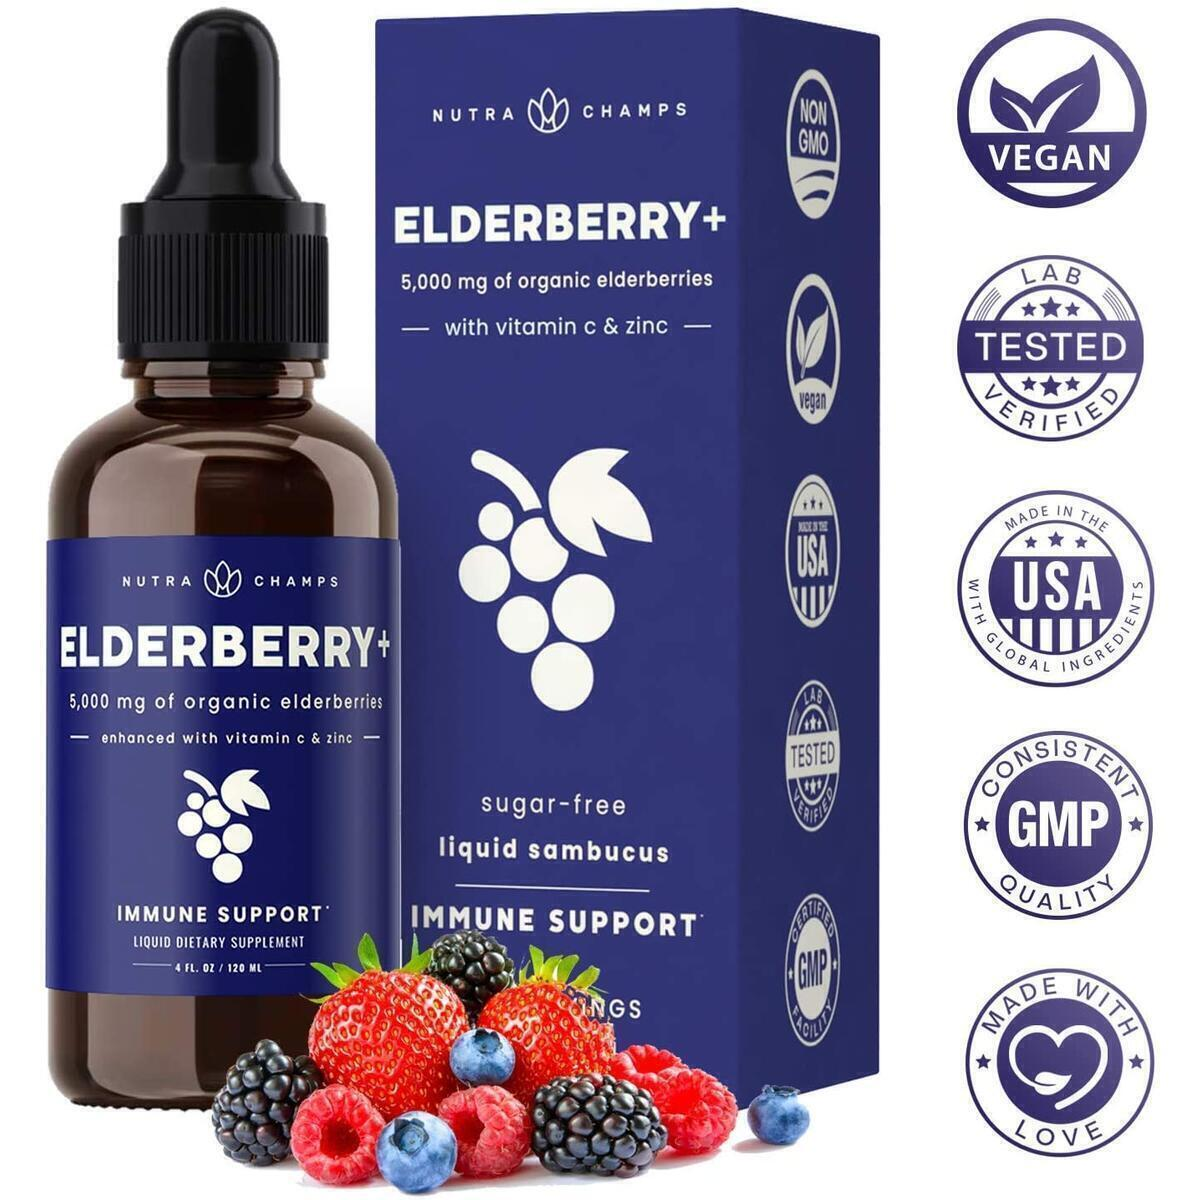 Organic Elderberry Syrup [5000mg Strength] Plus Zinc & Vitamin C Liquid Extract for Kids & Adults - Immune System Support - Vegan Sambucus Nigra Antioxidant Drops Supplement - Berry Flavor 2oz